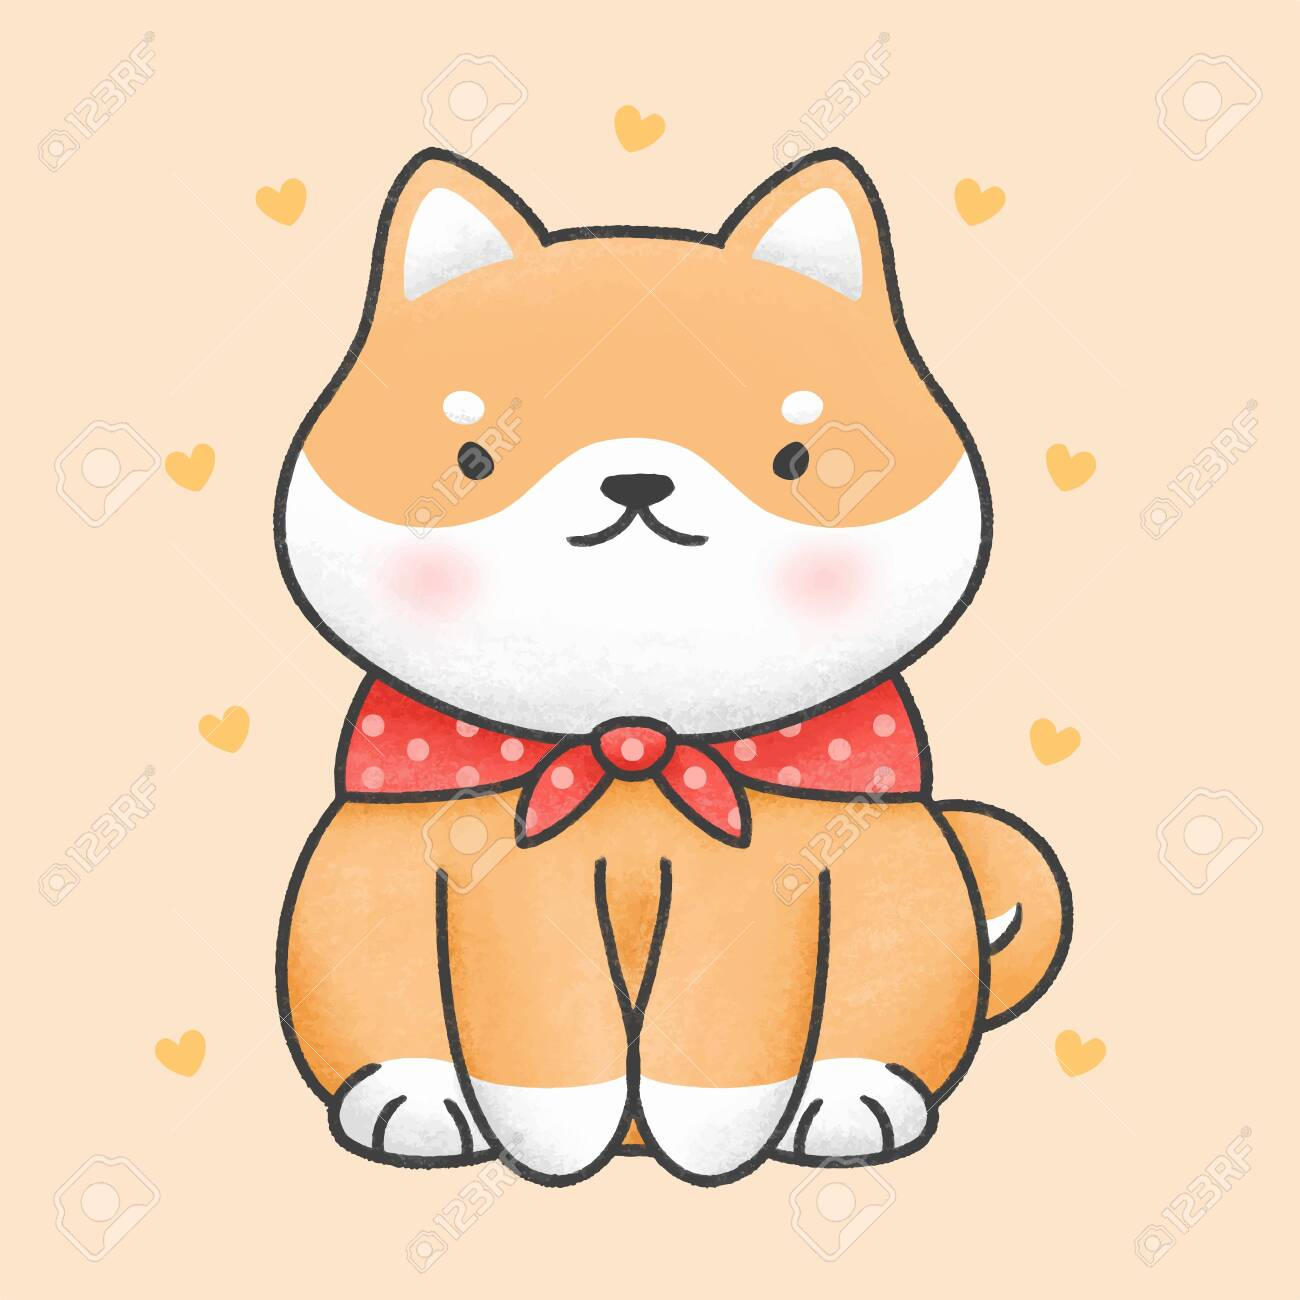 Cute Shiba Inu Dog Sitting Hand Drawn Cartoon Animal Character Royalty Free Cliparts Vectors And Stock Illustration Image 140417102